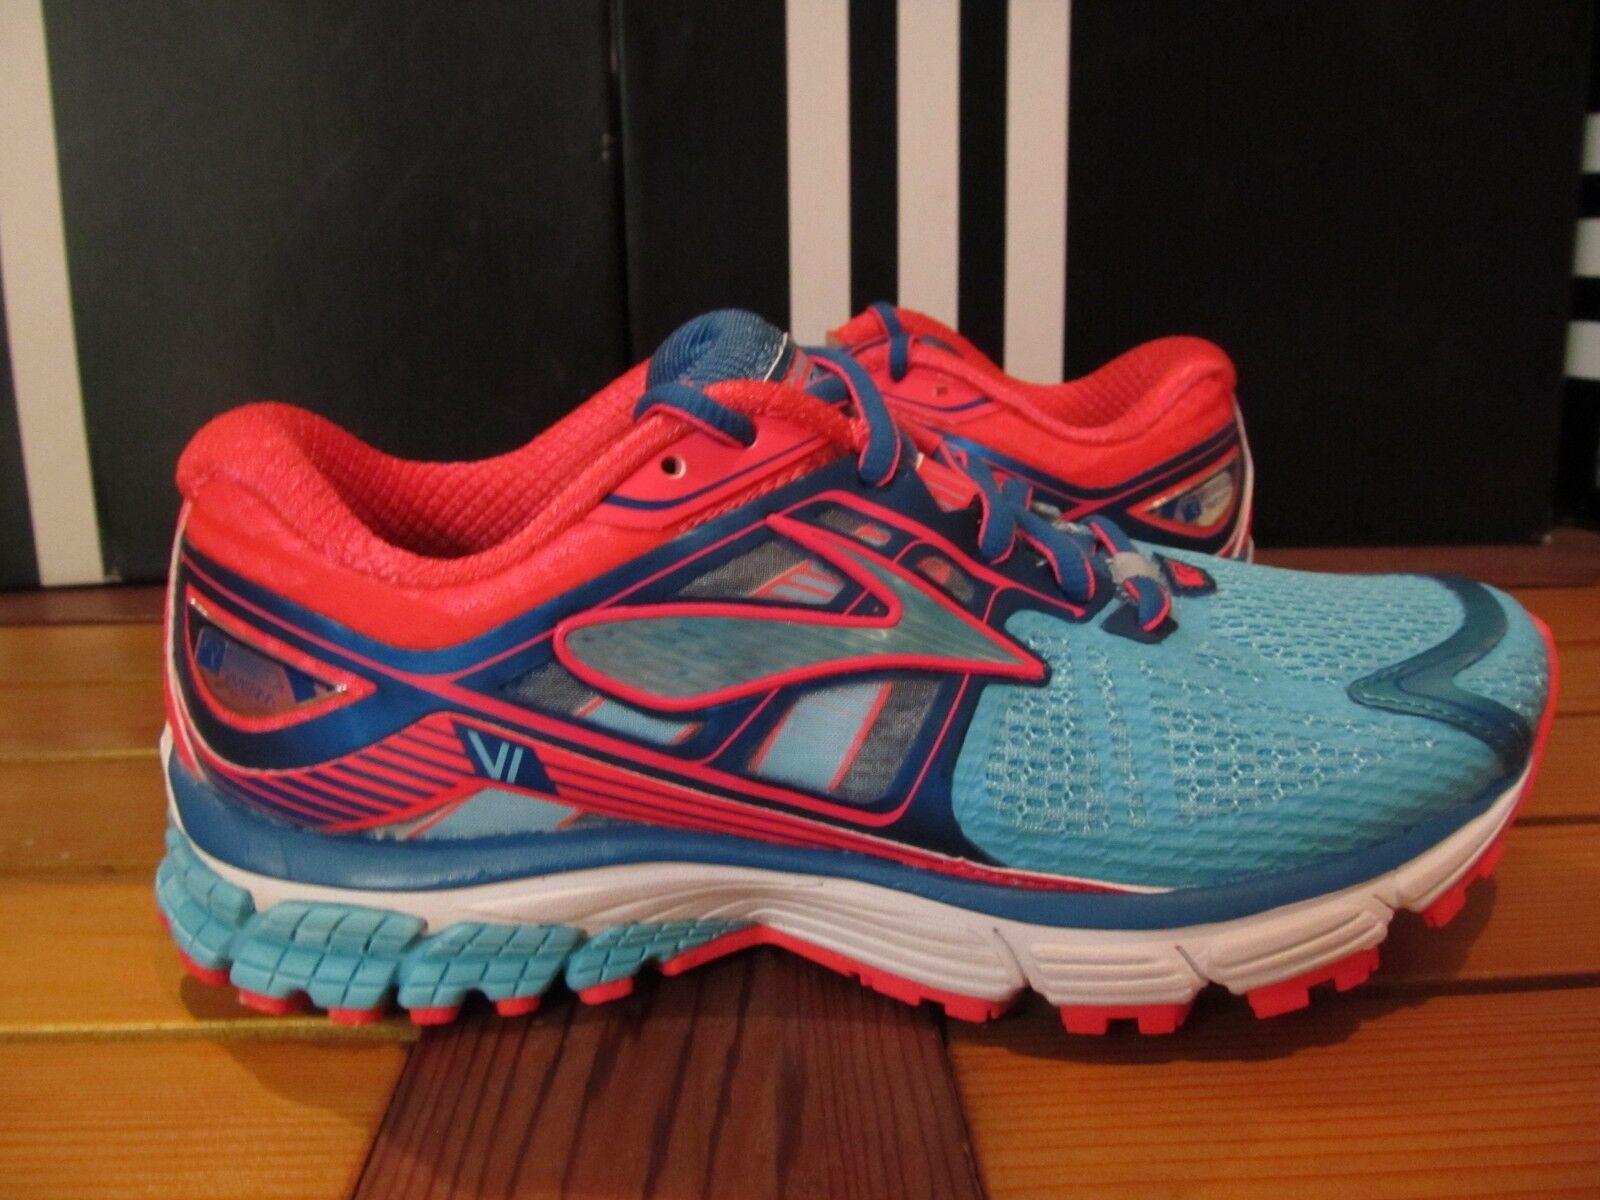 Neuf Femme Brooks Ravenna 6 bleu Rose 6 120182 1 B 497 Chaussures Course Marche